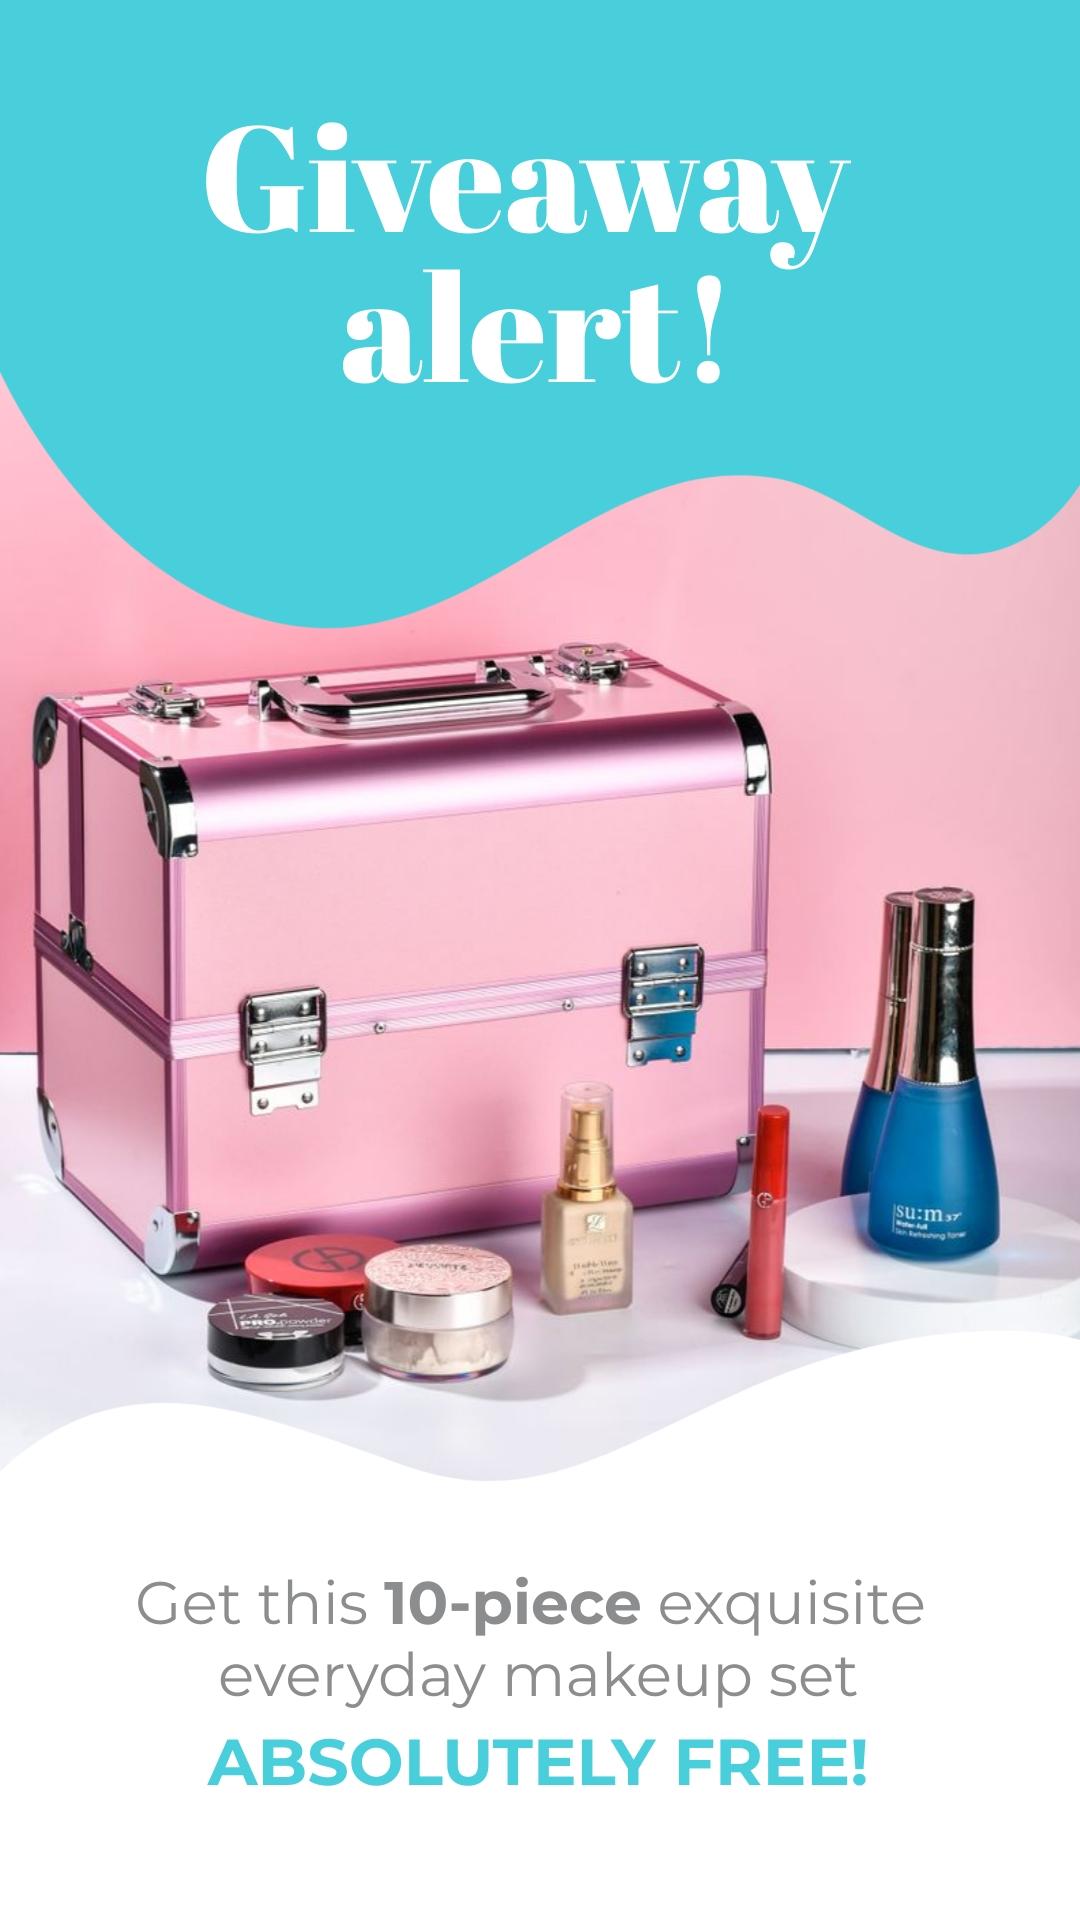 Makeup Giveaway - Instagram Video Ad Template